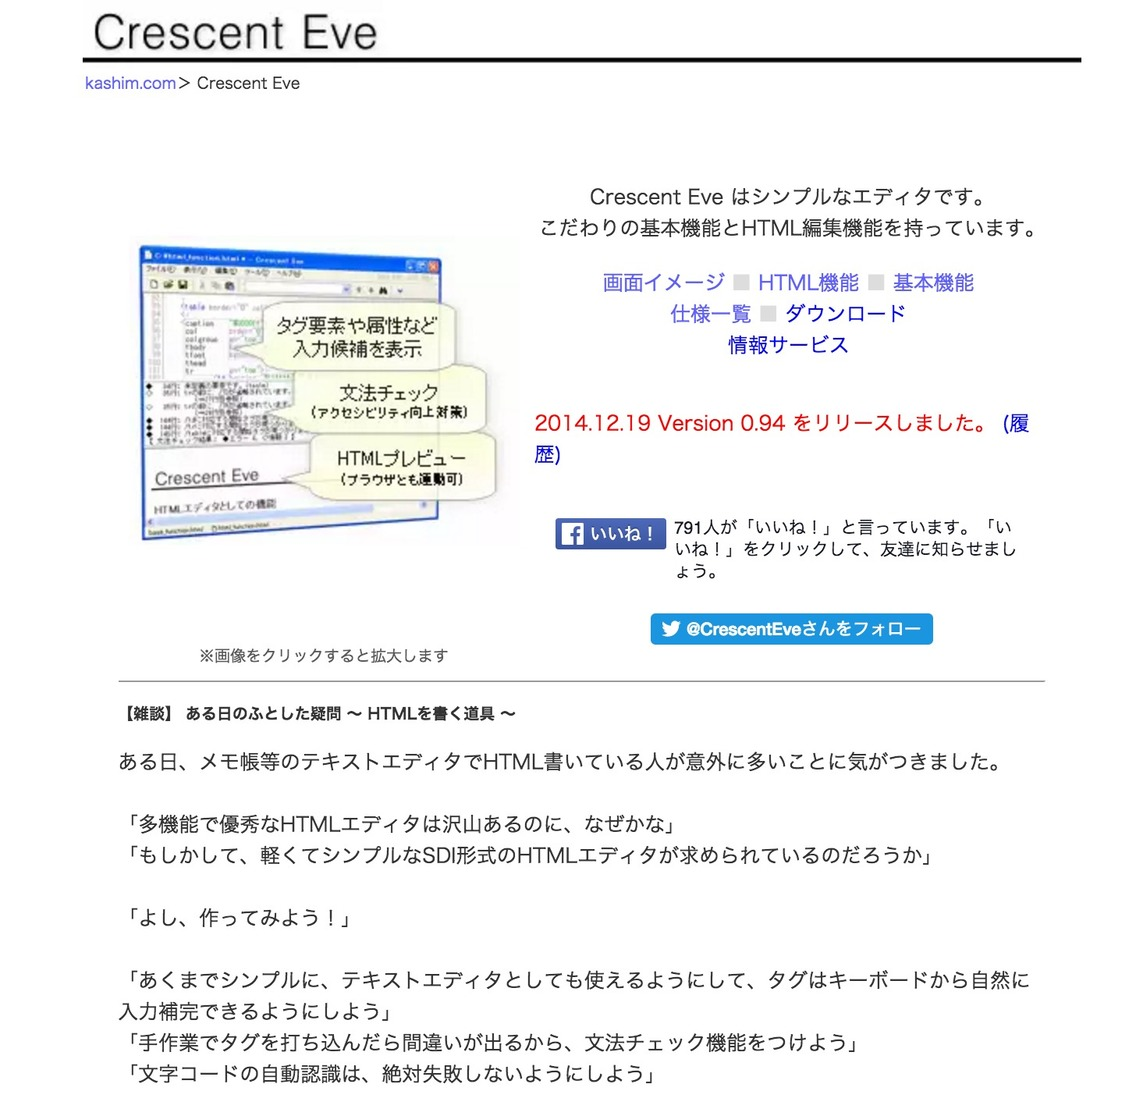 Crescent_Eve.png